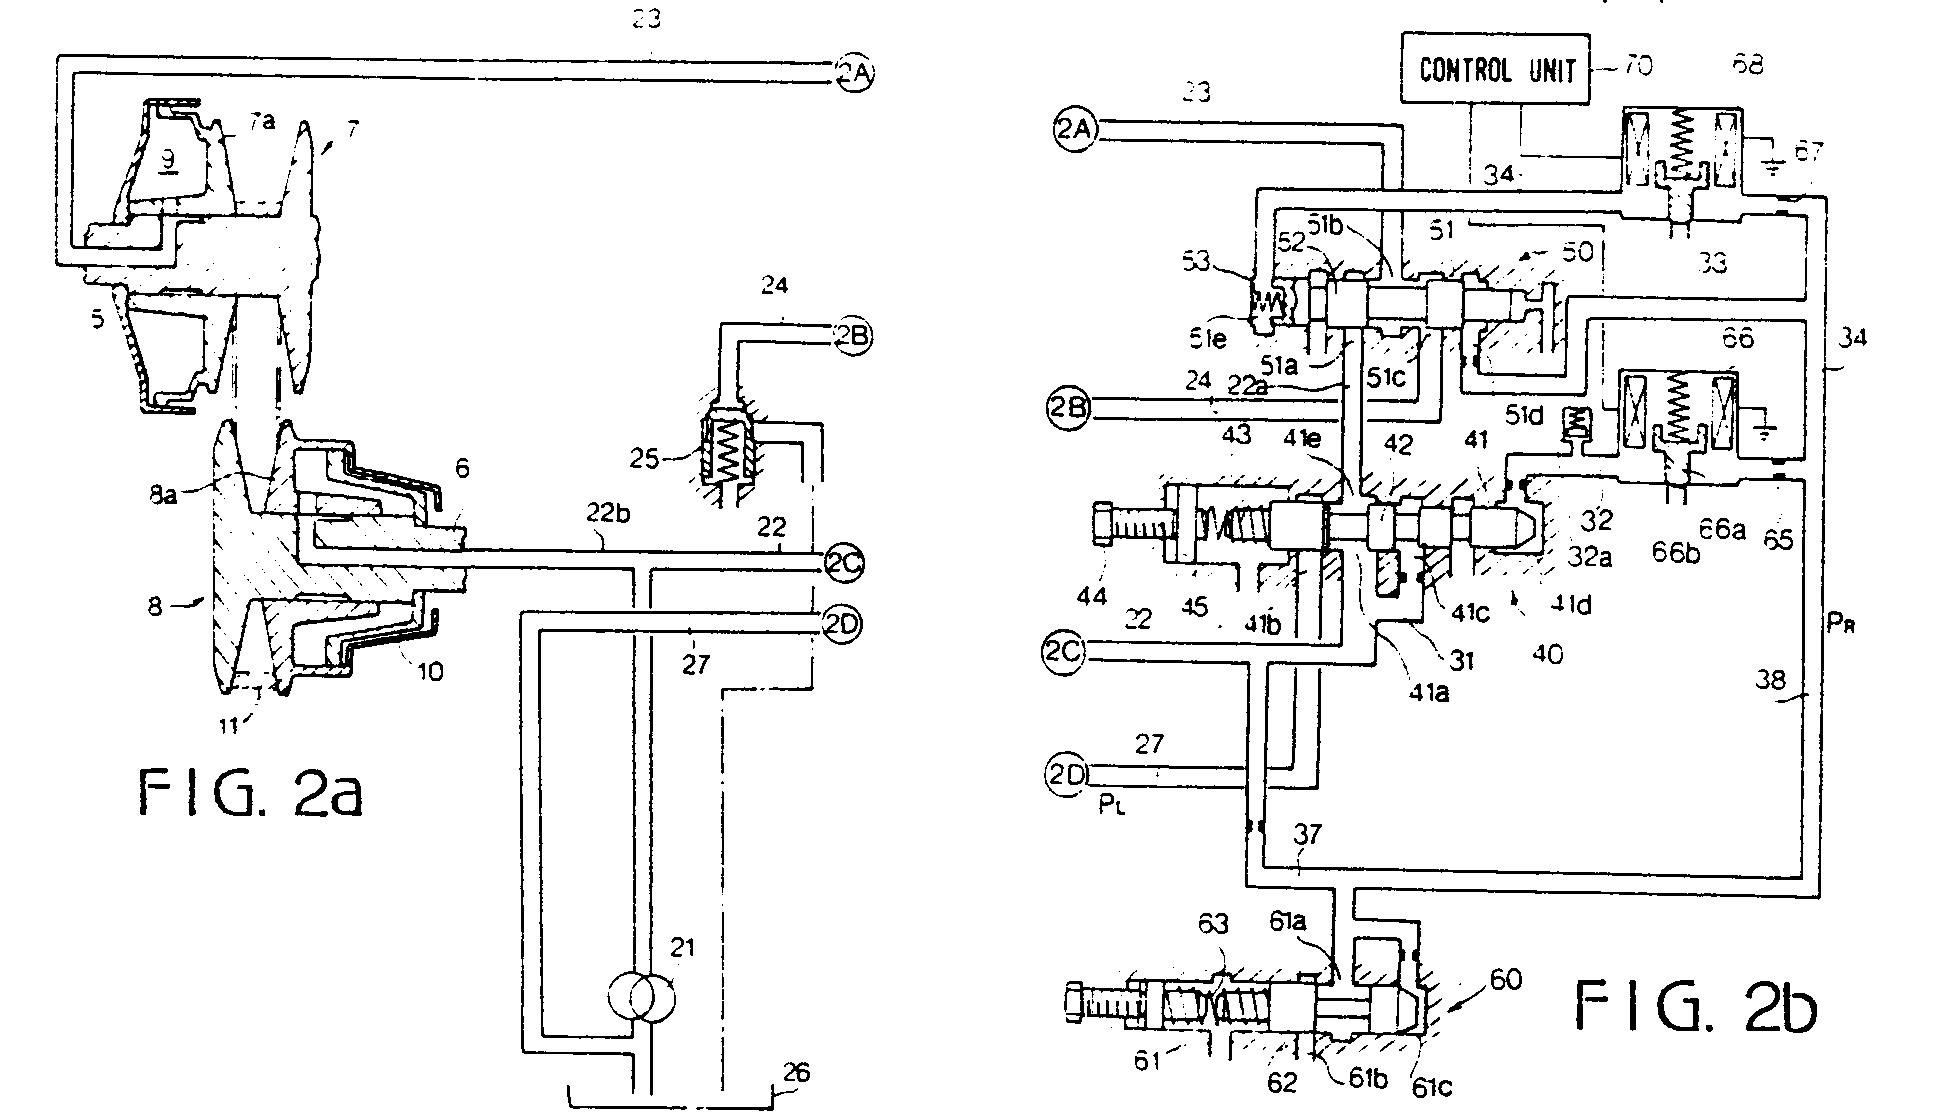 98 honda continuously variable transmission diagram wiring diagram u2022 rh 45 32 164 46 honda automatic transmission parts honda crv automatic transmission diagram